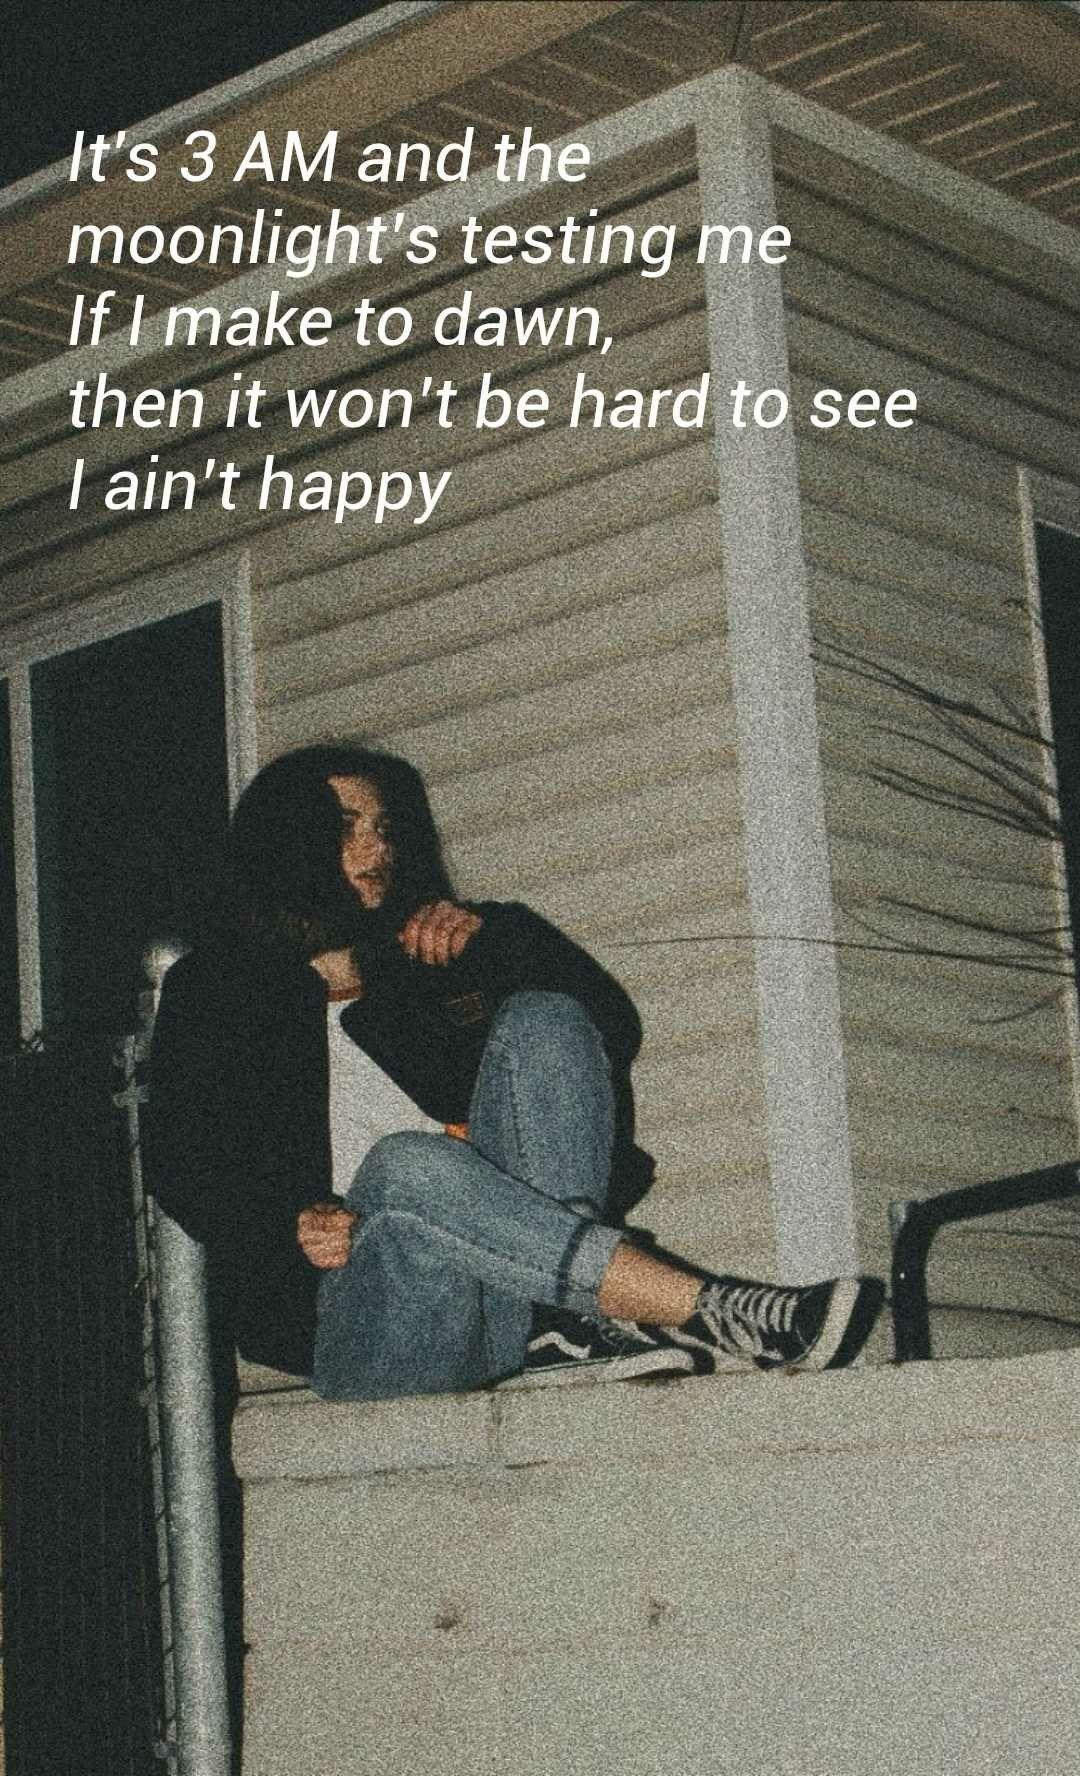 lie to me lyrics by Esmeralda Eustaquio